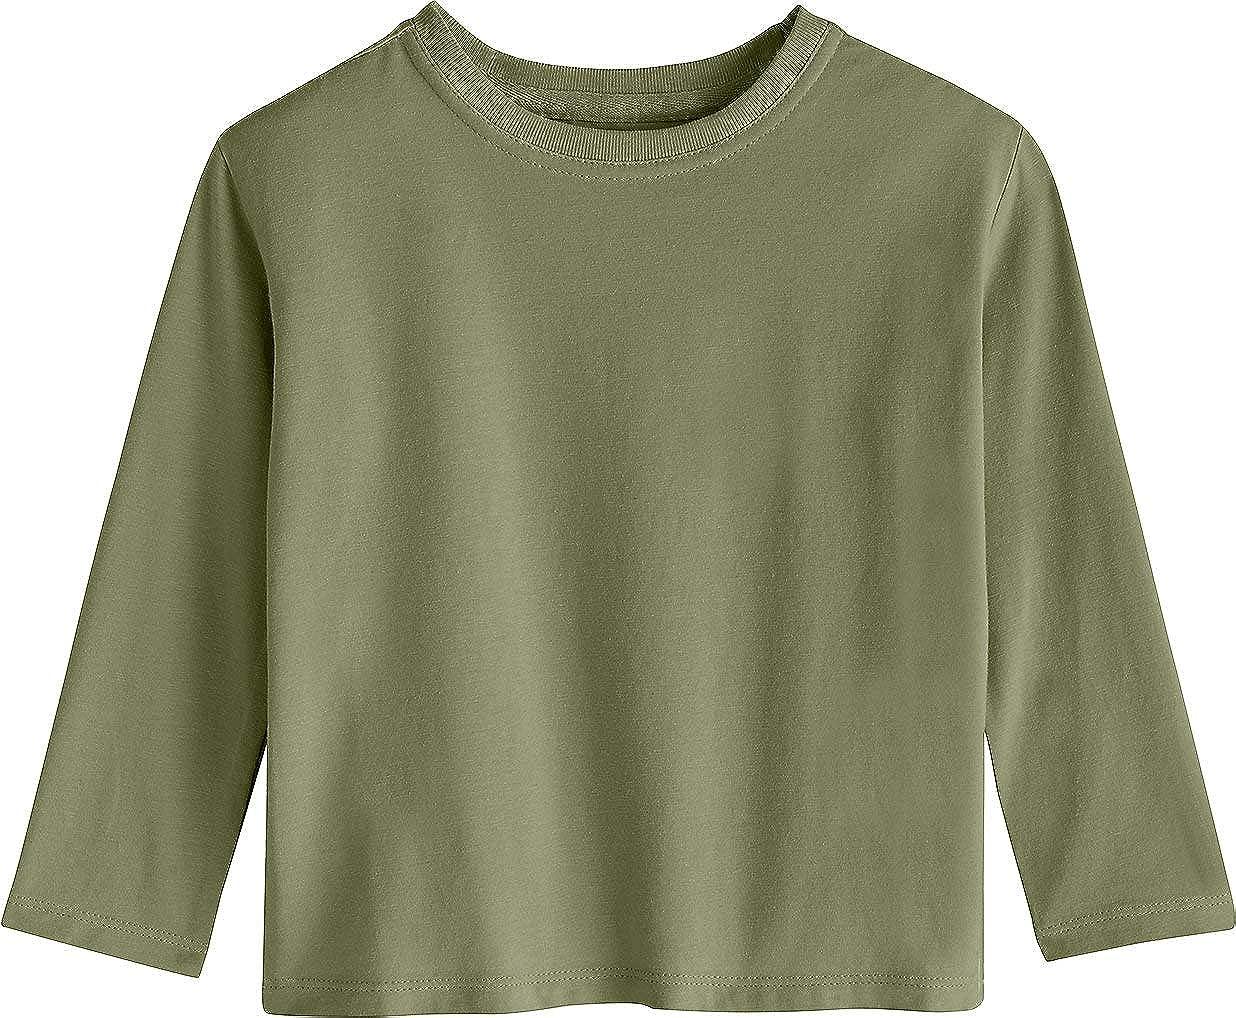 Toddler Coco Plum Everyday Long Sleeve T-Shirt Sun Protective Coolibar UPF 50